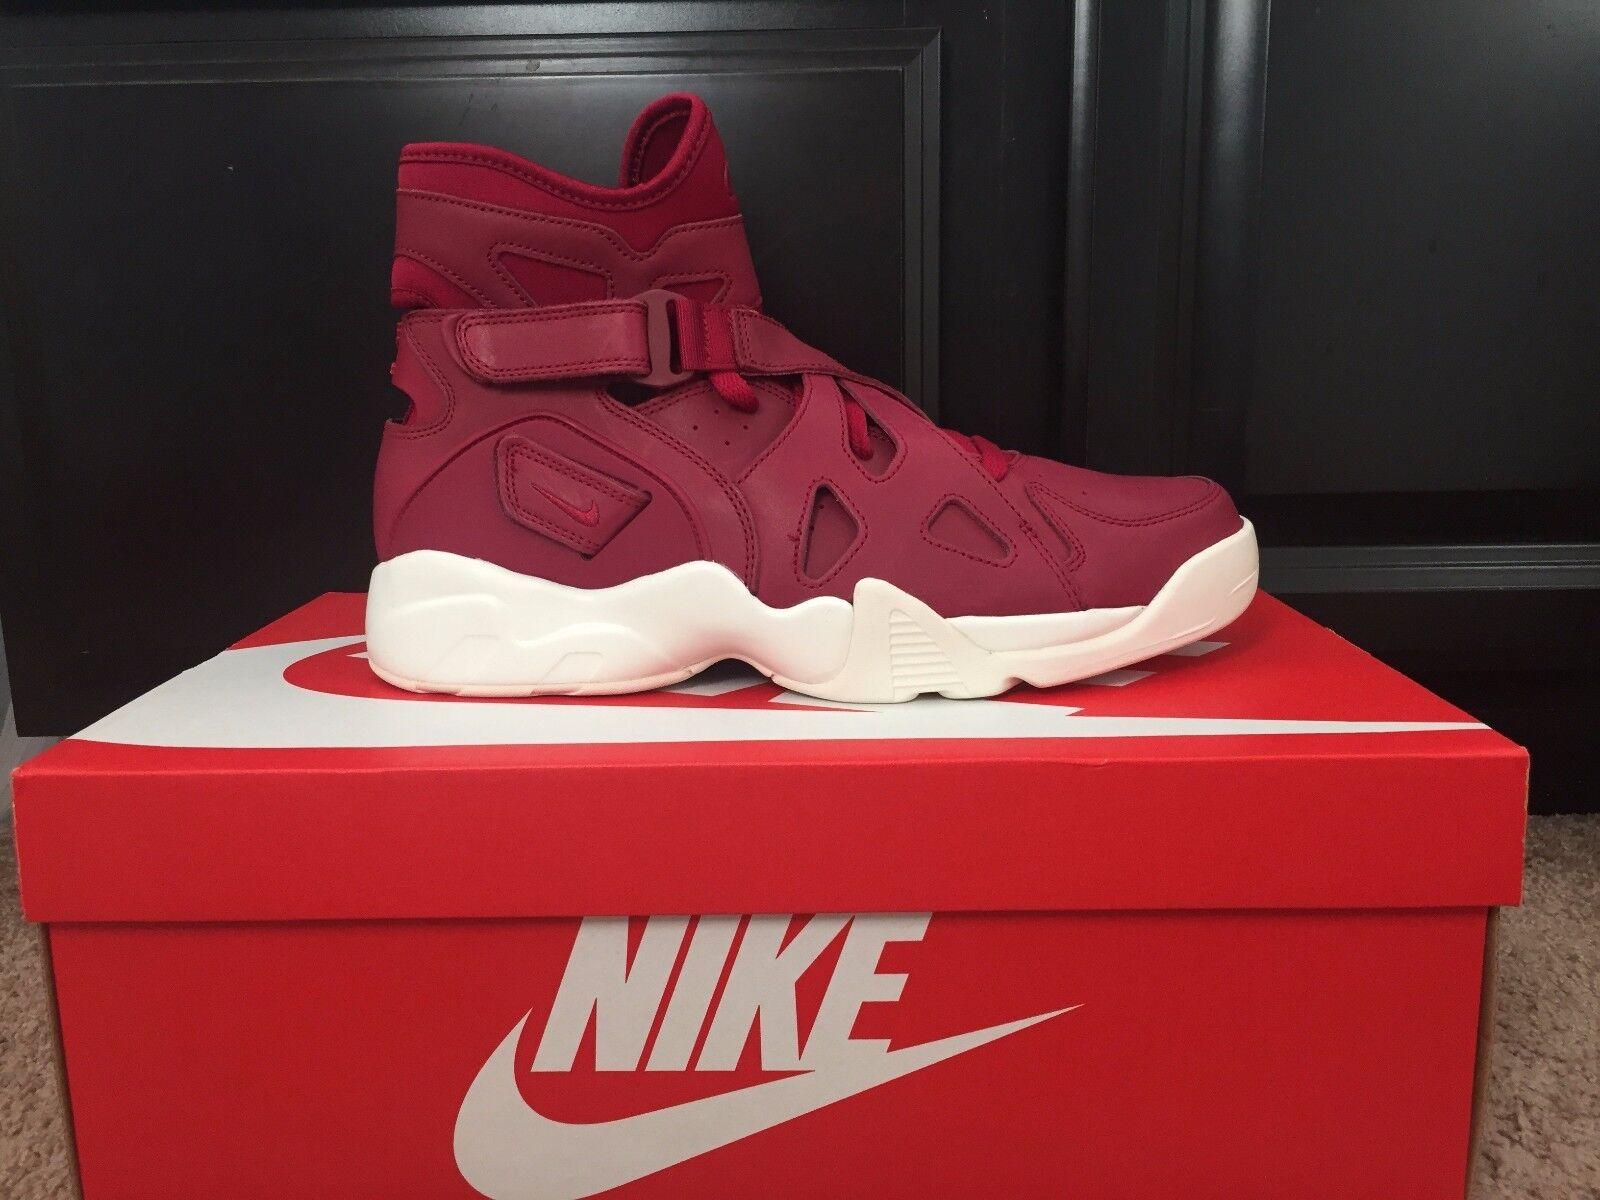 Nike air illimitata 854318-661 dimensioni nobile rosso / nobile red vela